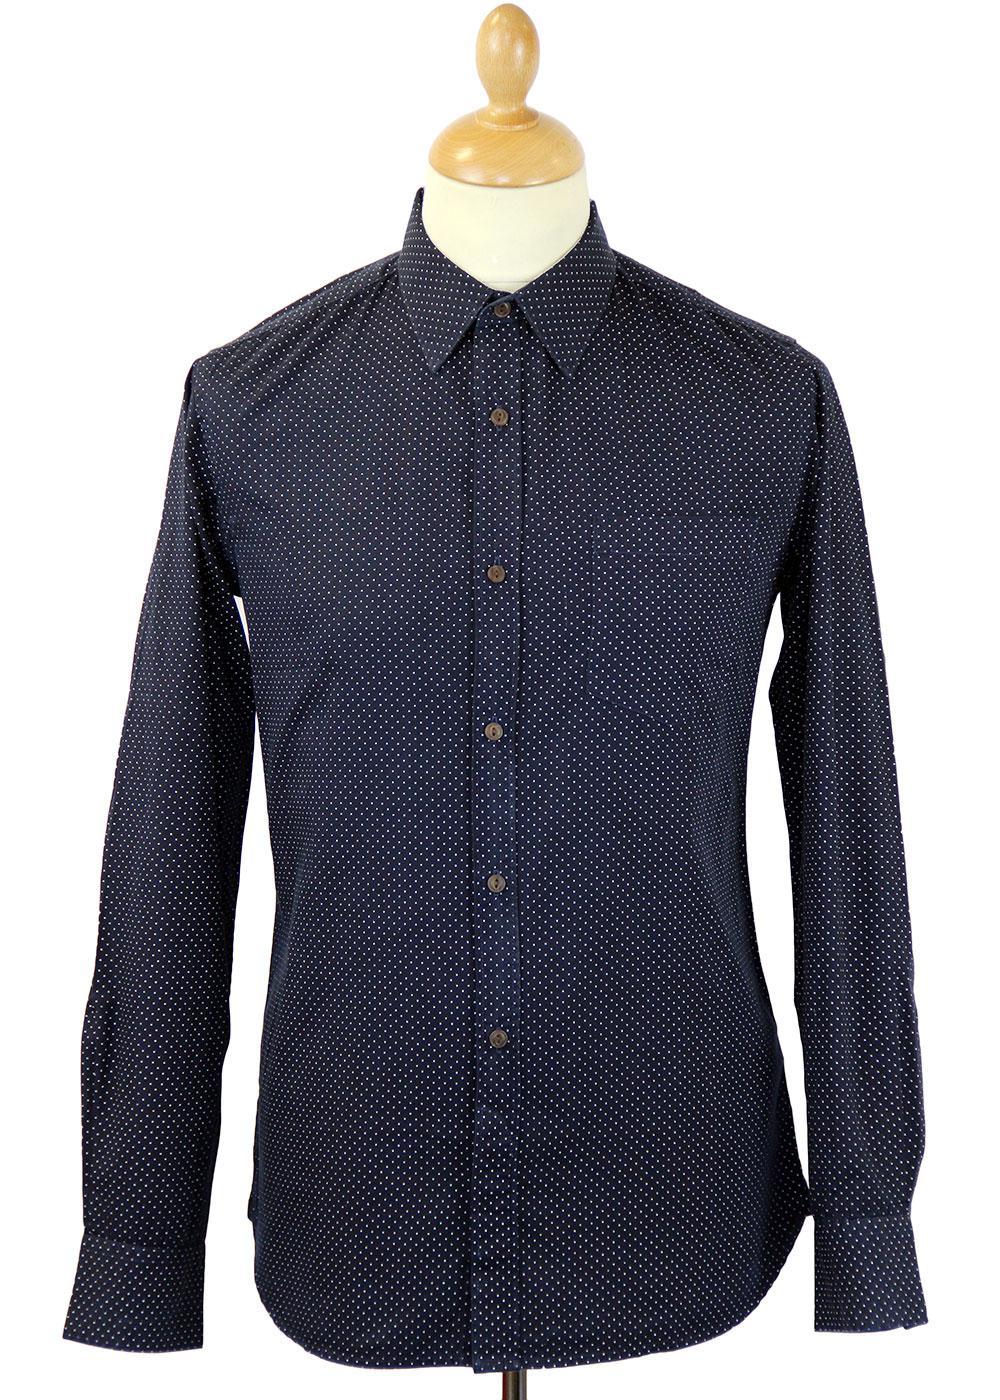 Charley French Connection Mod Polka Dot Shirt (MB)